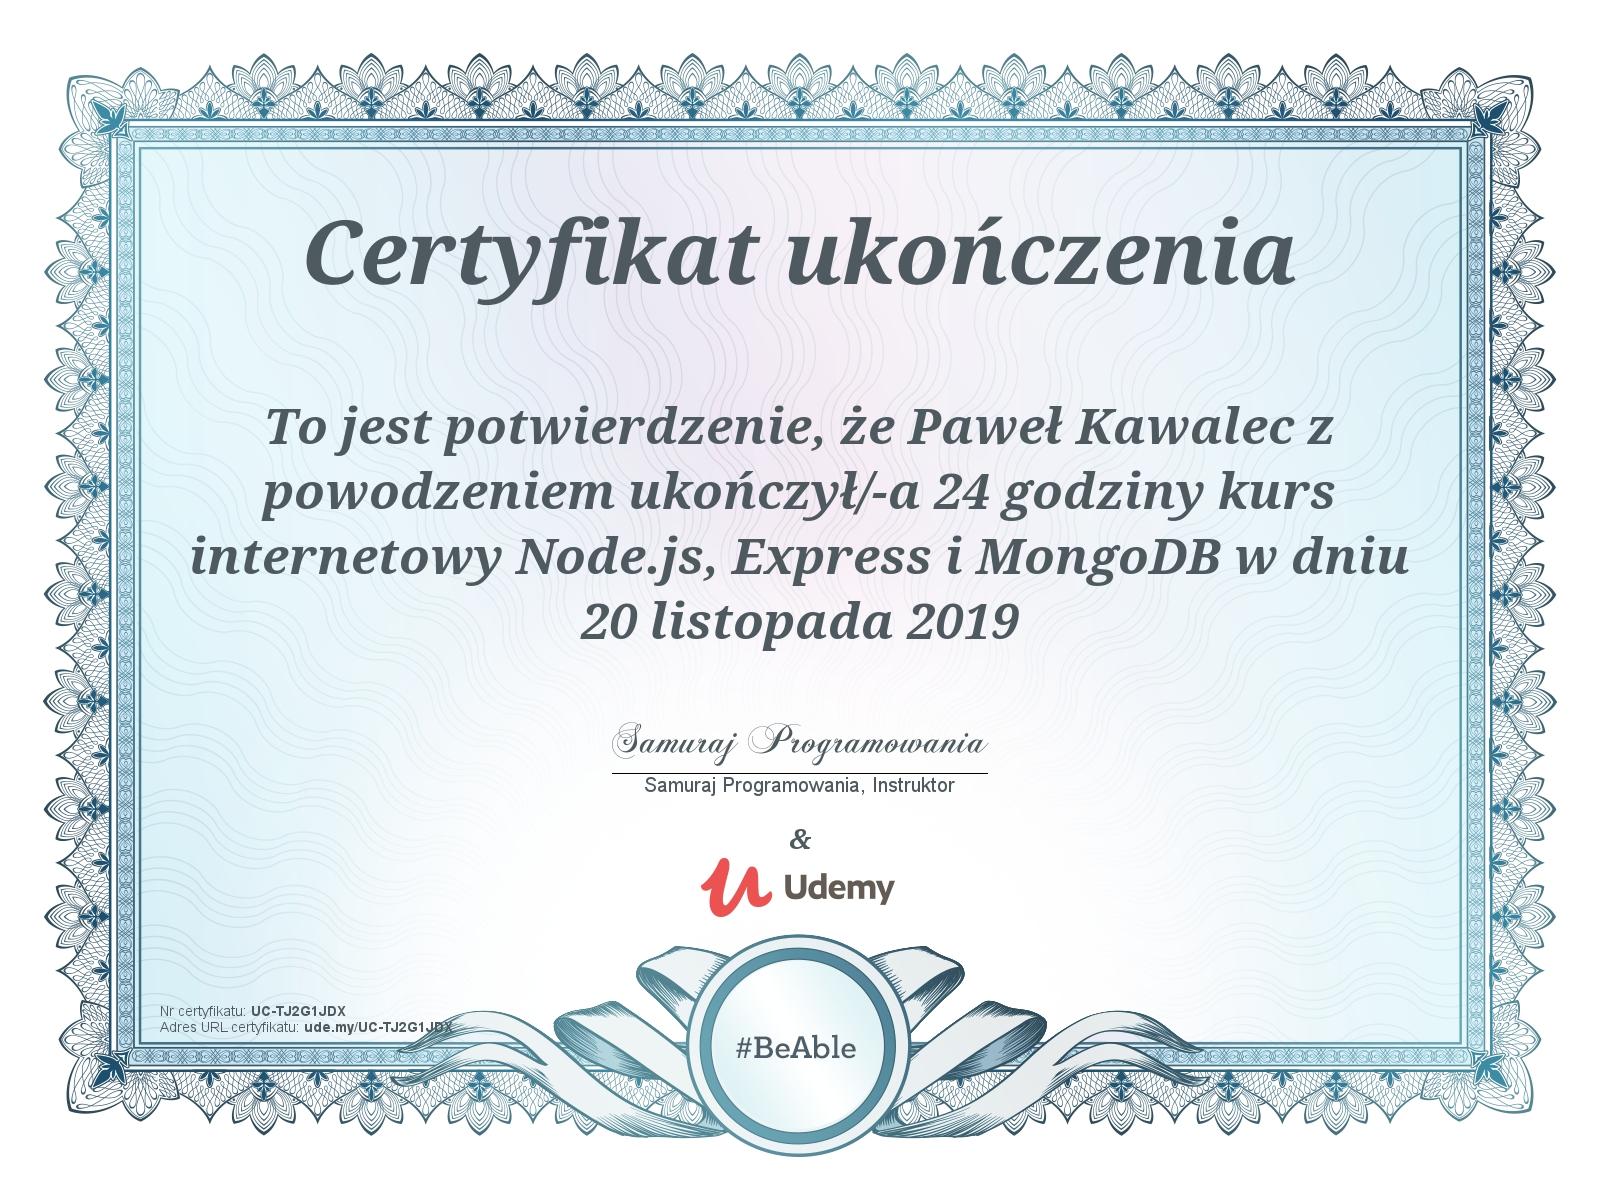 Node.js, Express i MongoDB